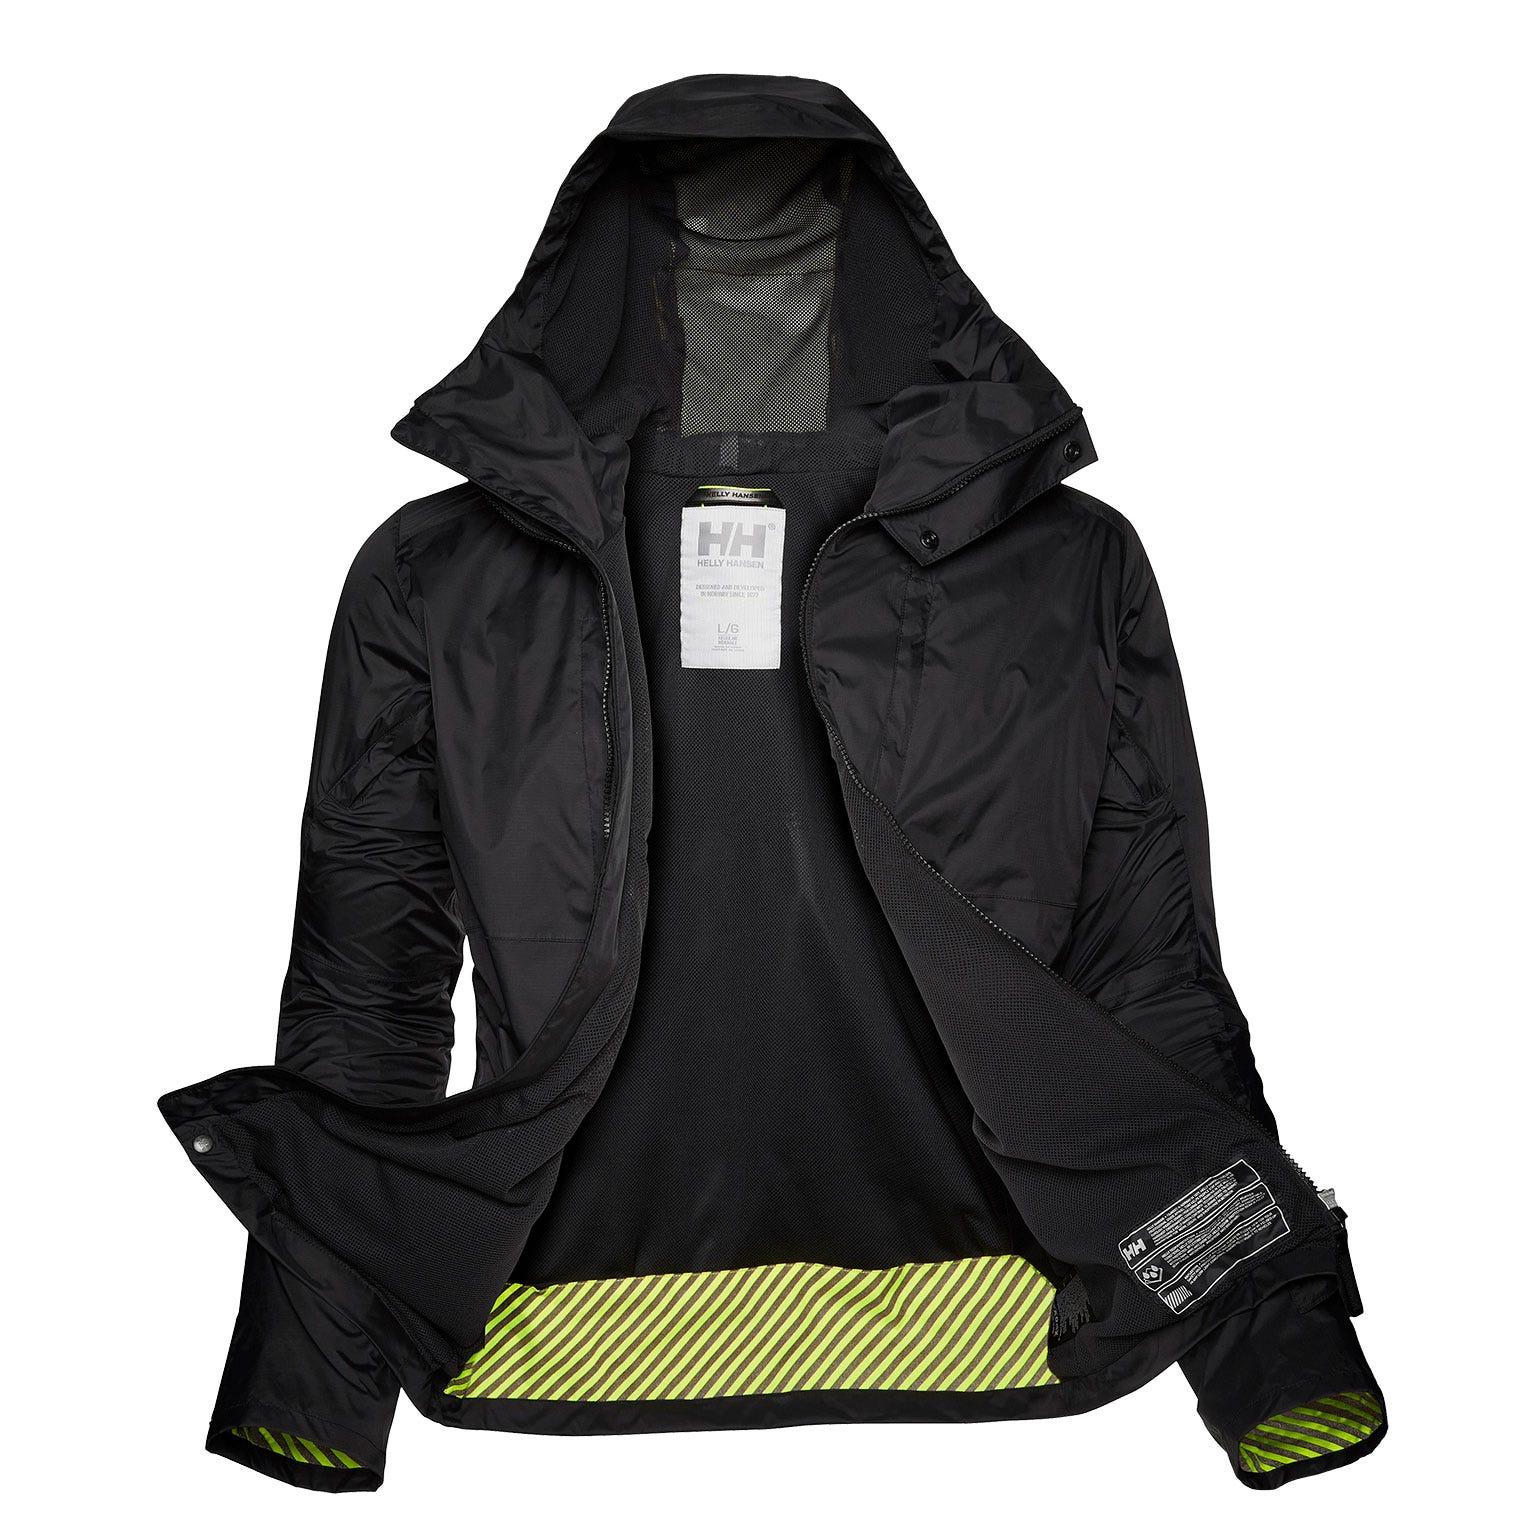 Helly Hansen Coasting Jacket Mens Rain Black L